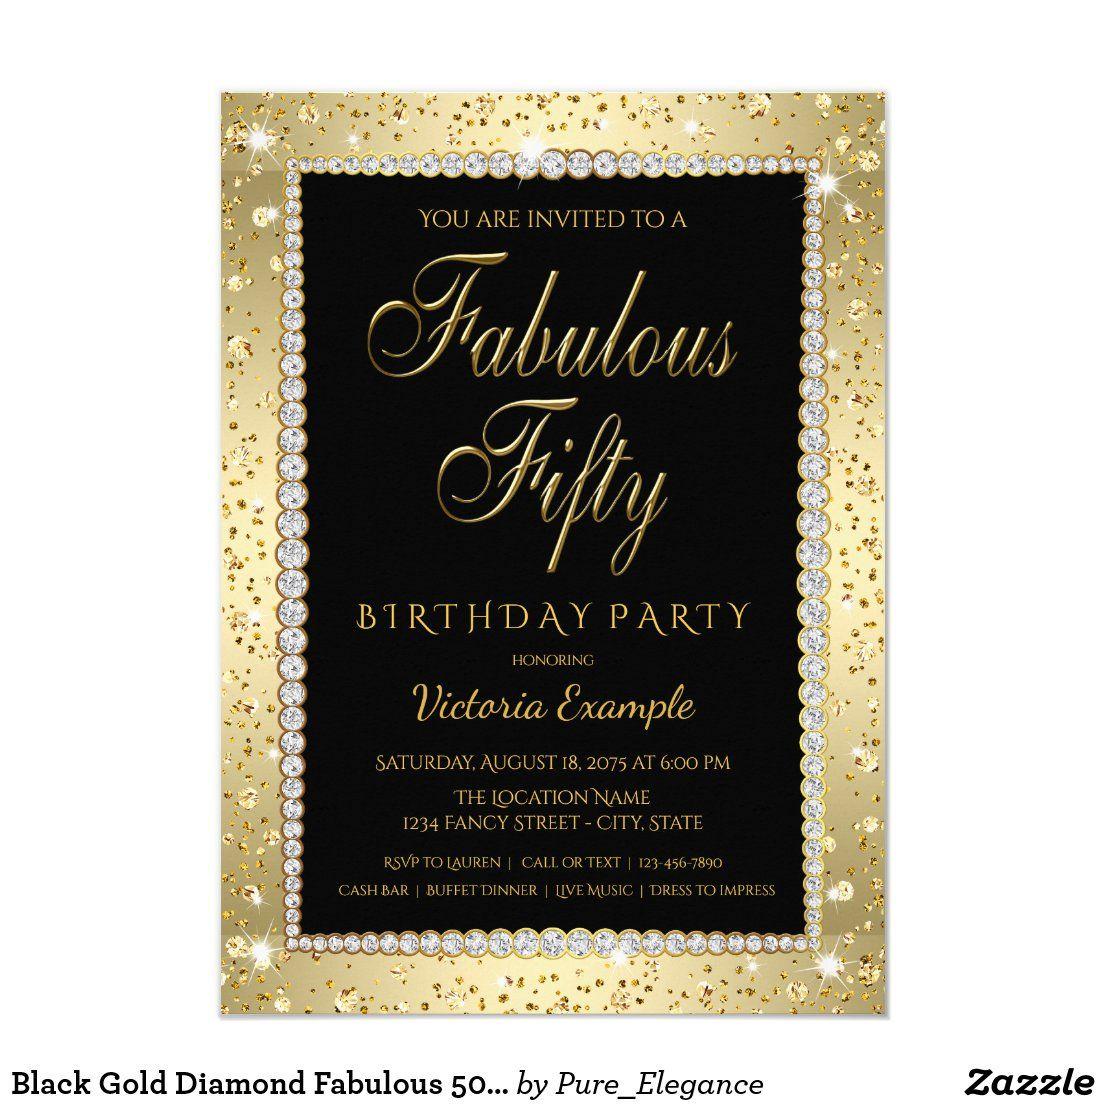 Black Gold Diamond Fabulous 50 Birthday Invitation in 2020 | 50th birthday  invitations, 50th birthday party invitations, Birthday invitations